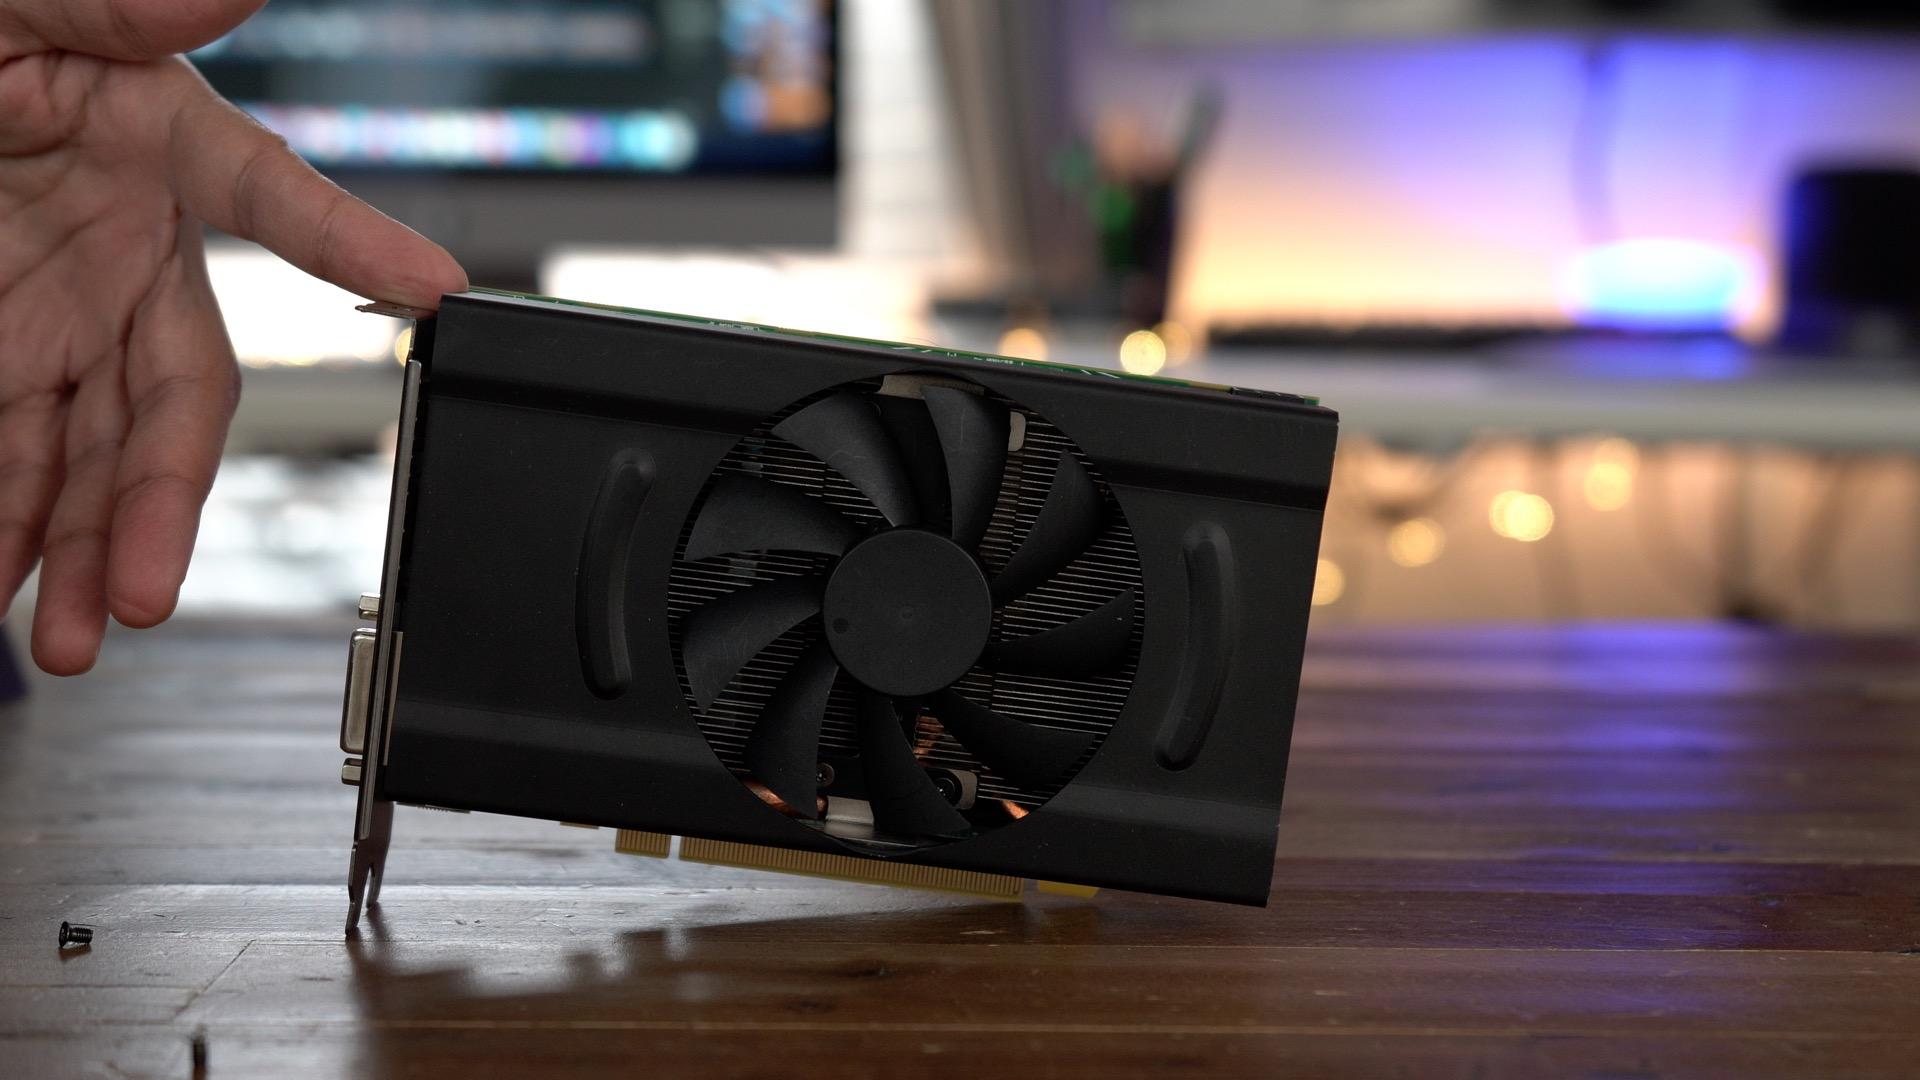 PowerColor Mini Pro eGPU RX 570 GPU out